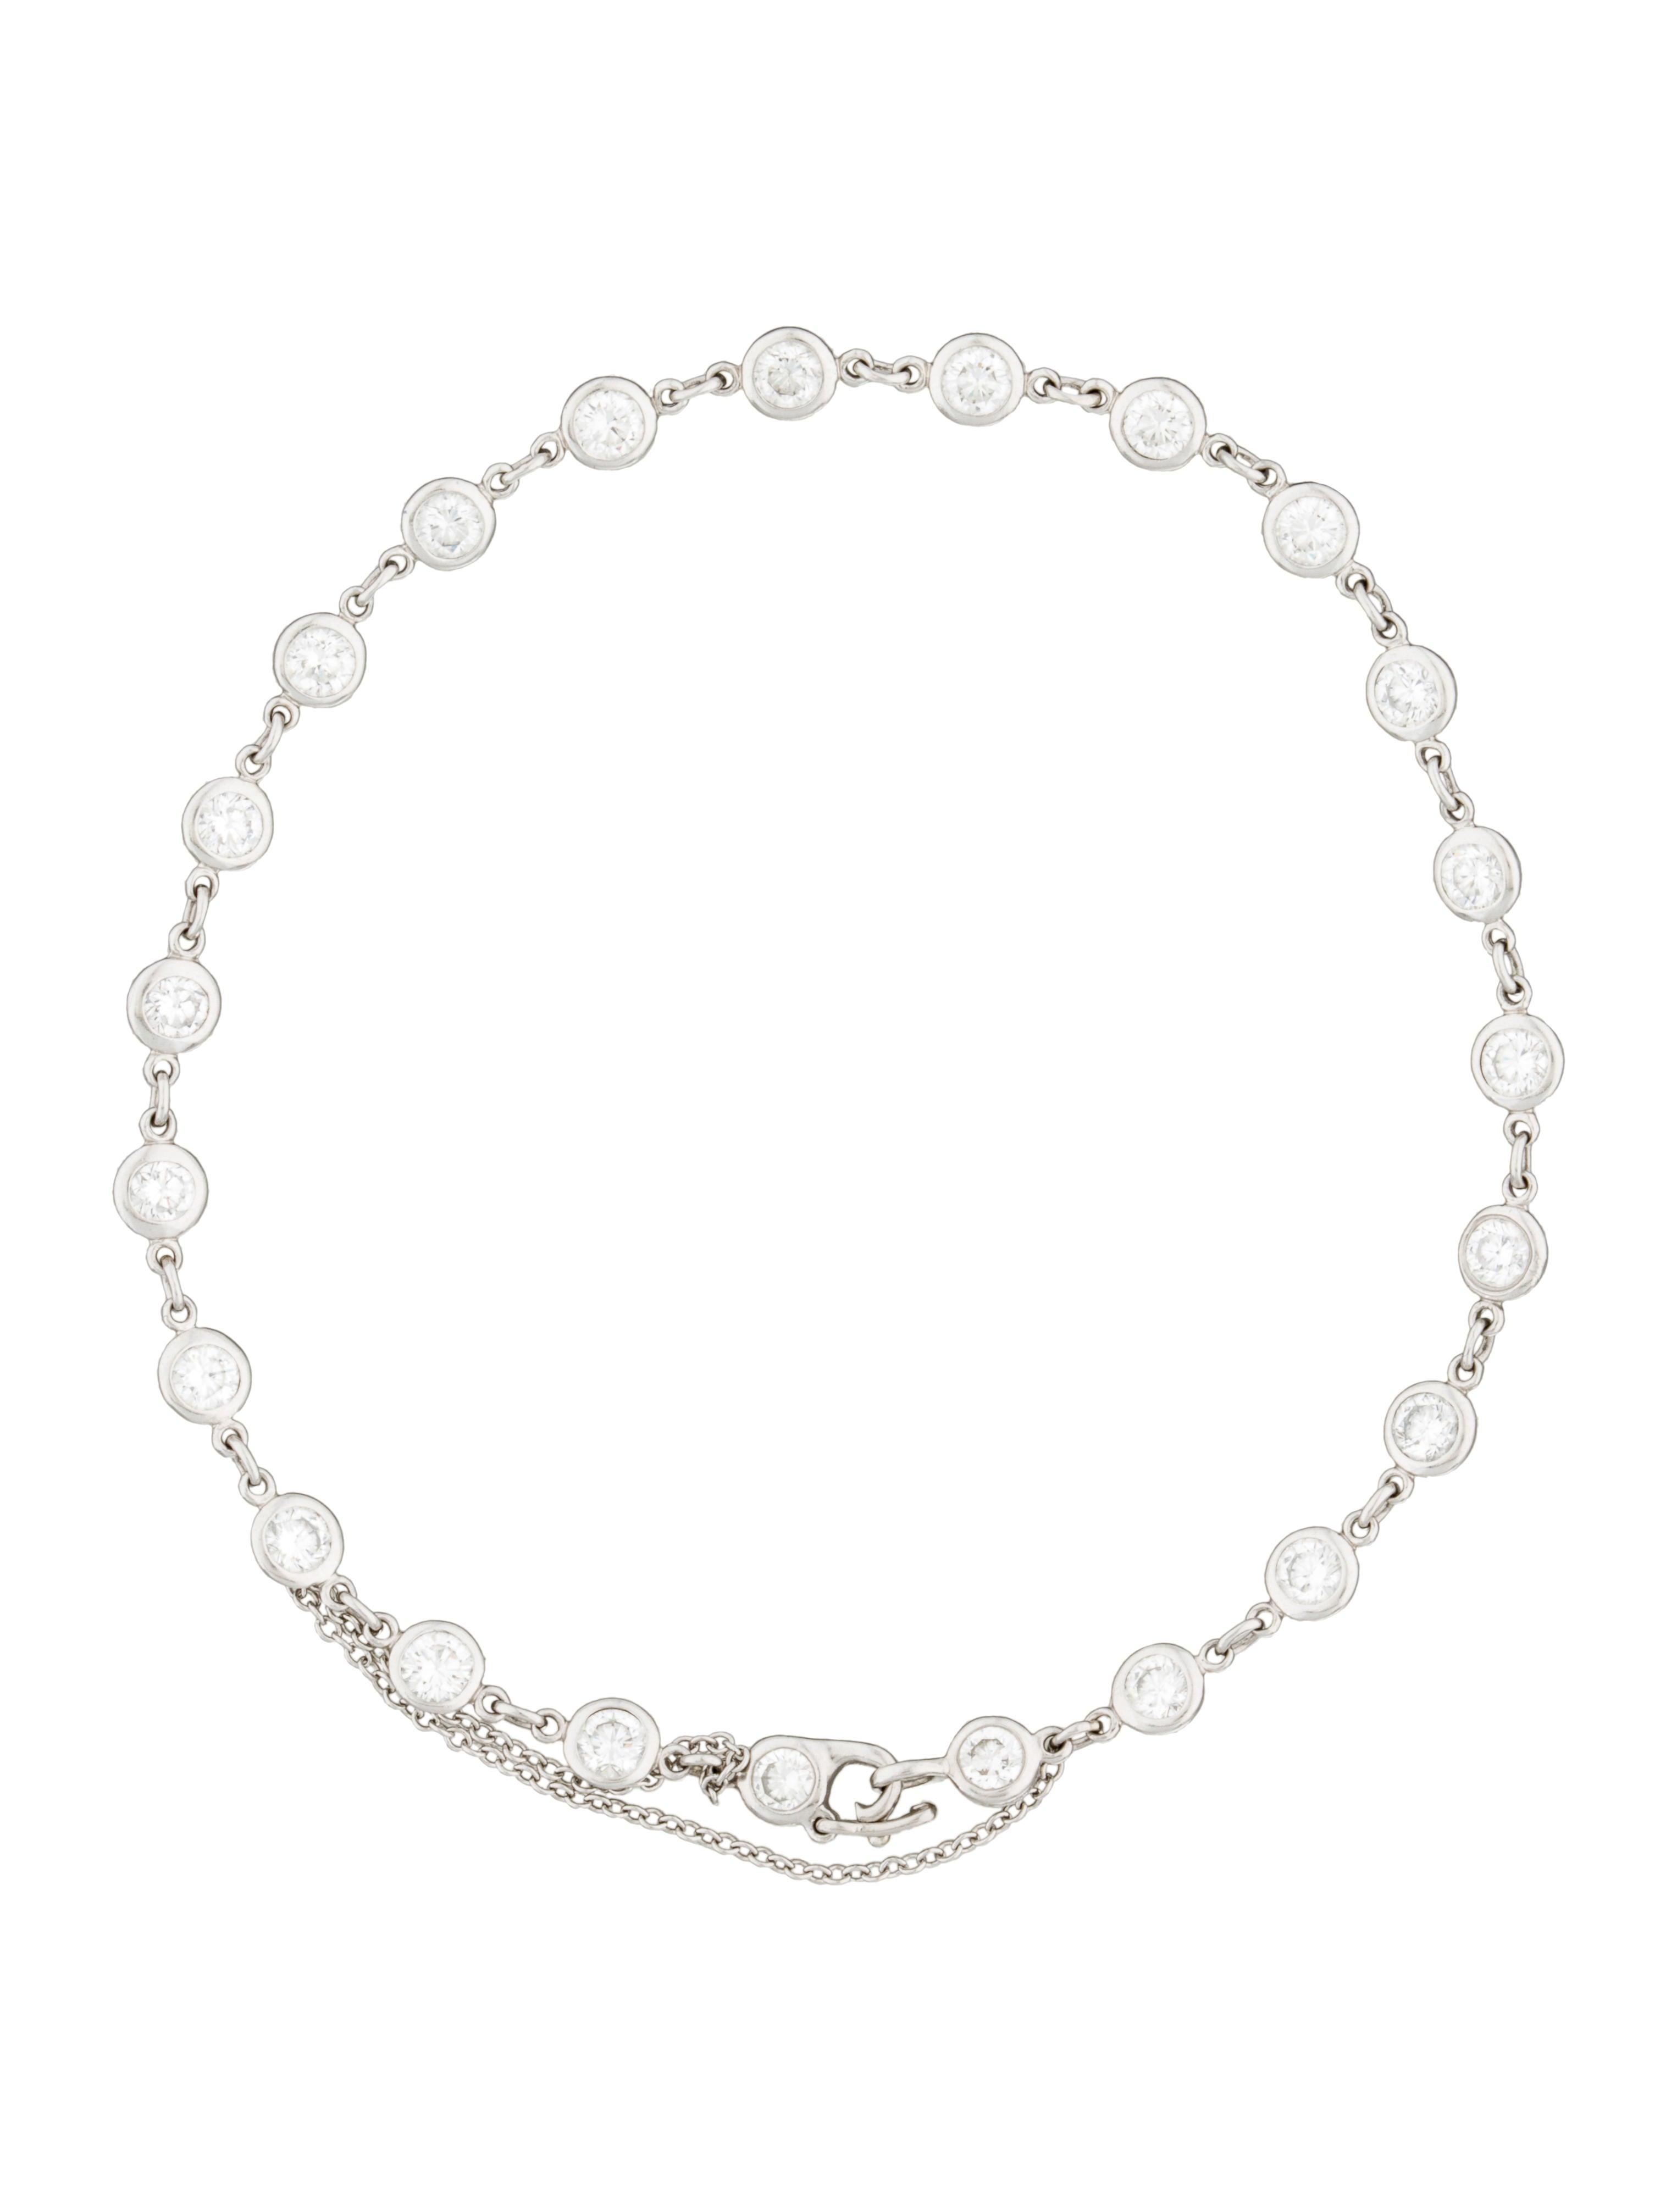 Tiffany co diamonds by the yard bracelet bracelets for Diamonds by the yard ring